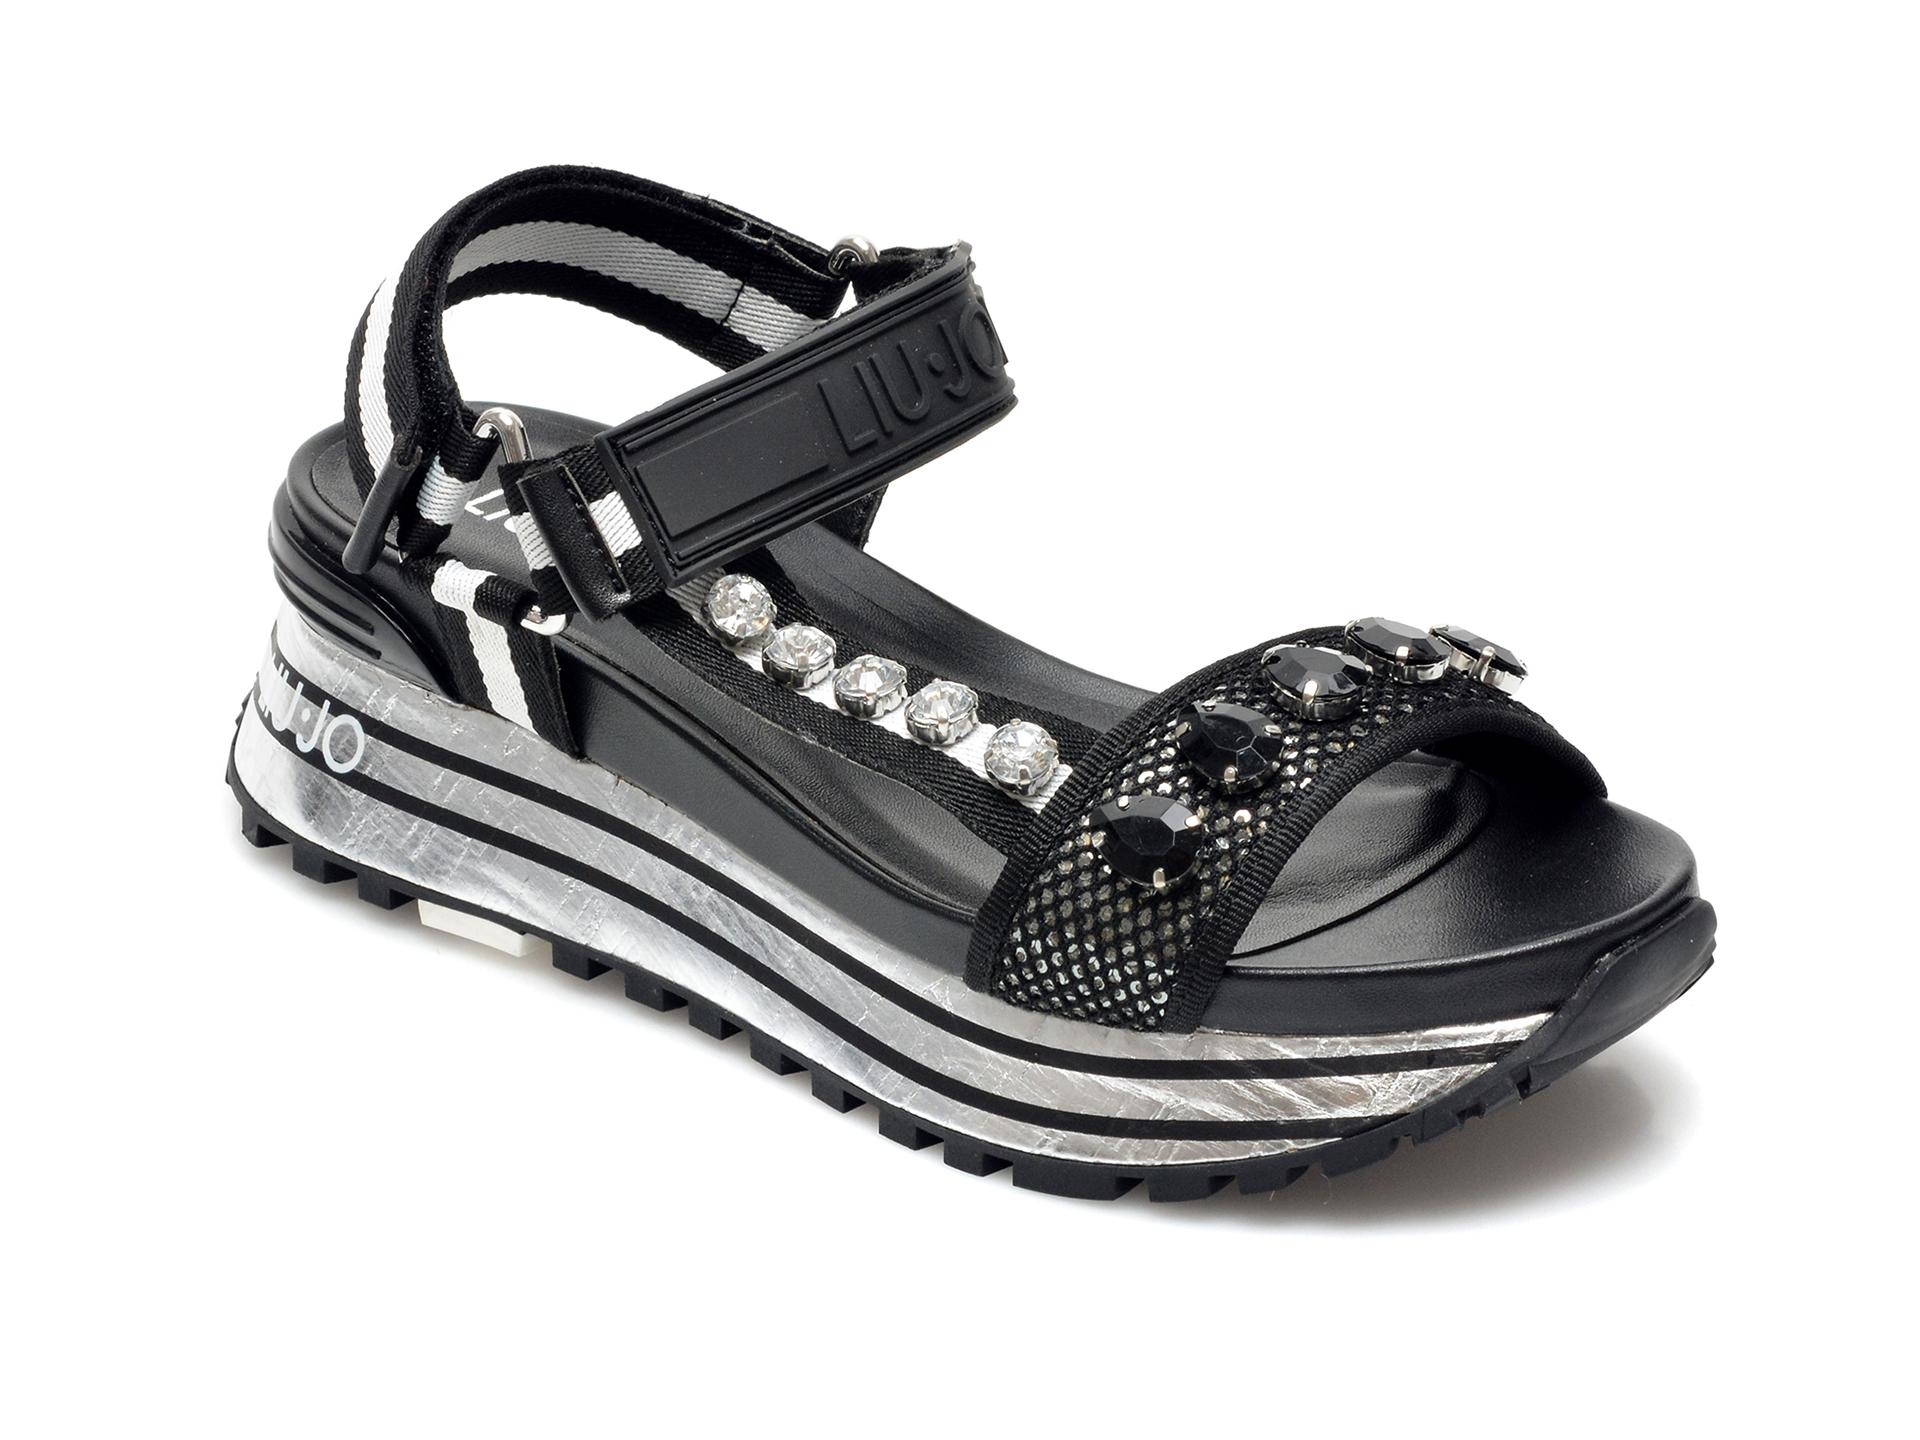 Sandale LIU JO negre, Maxi Wonder Sandal 10, din material textil